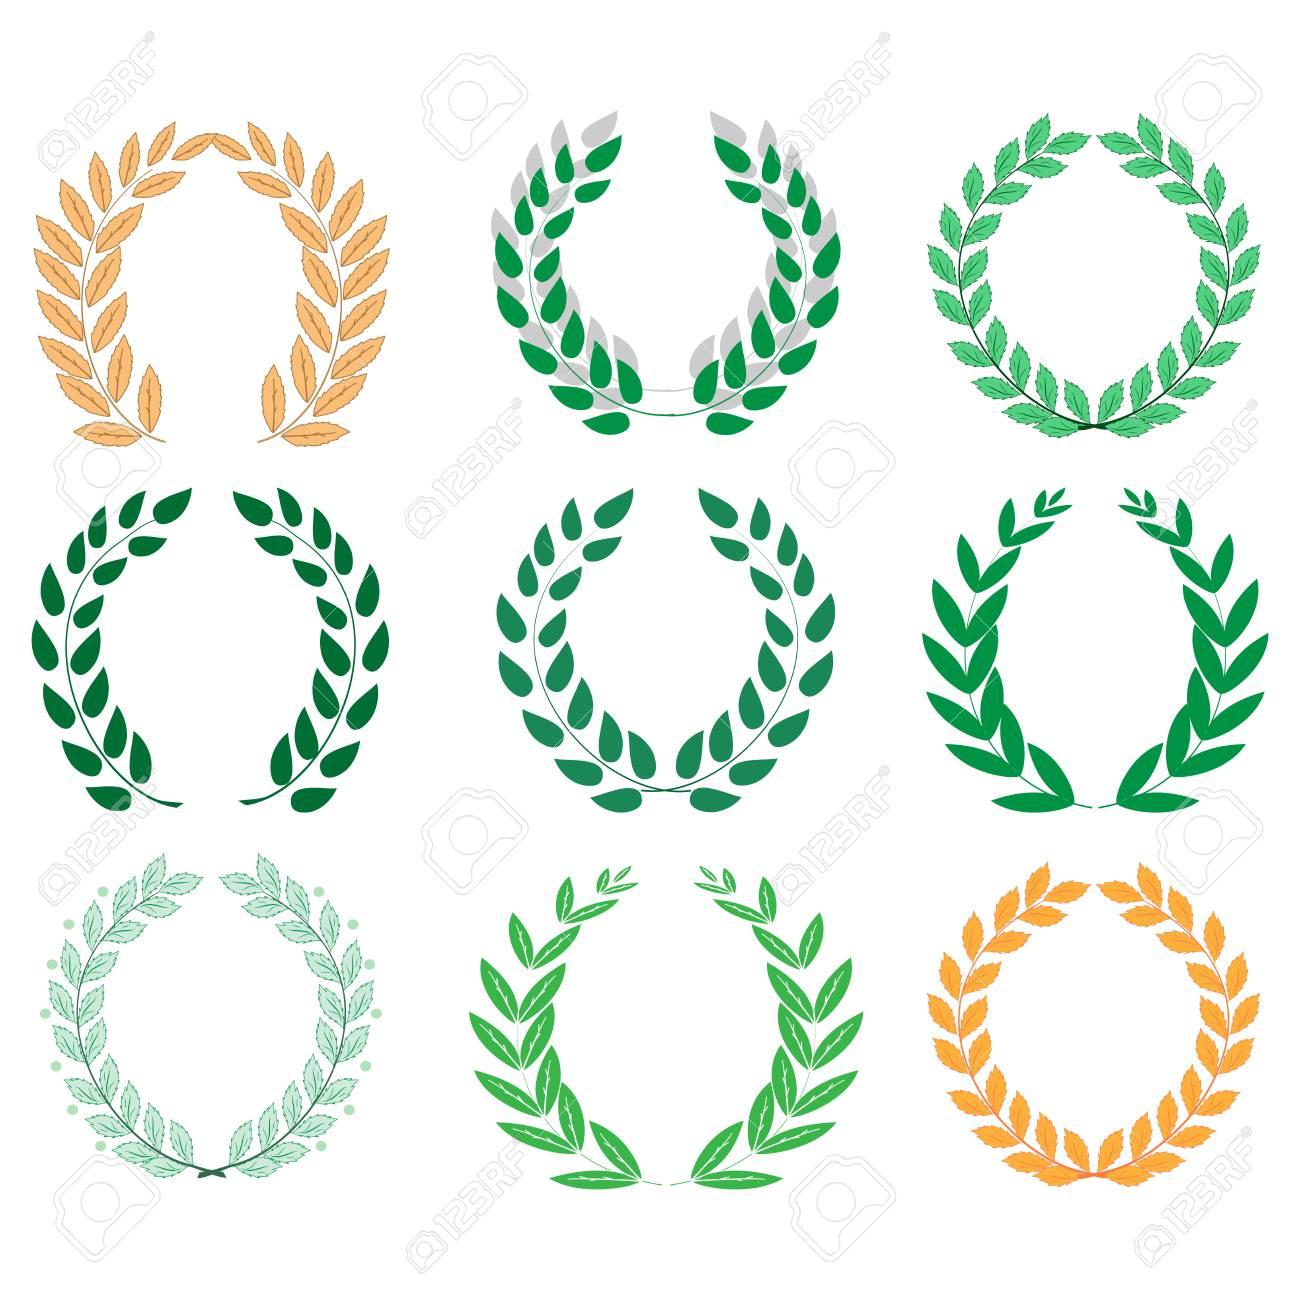 Laurel Wreath Reward Set Modern Symbol Of Victory And Award